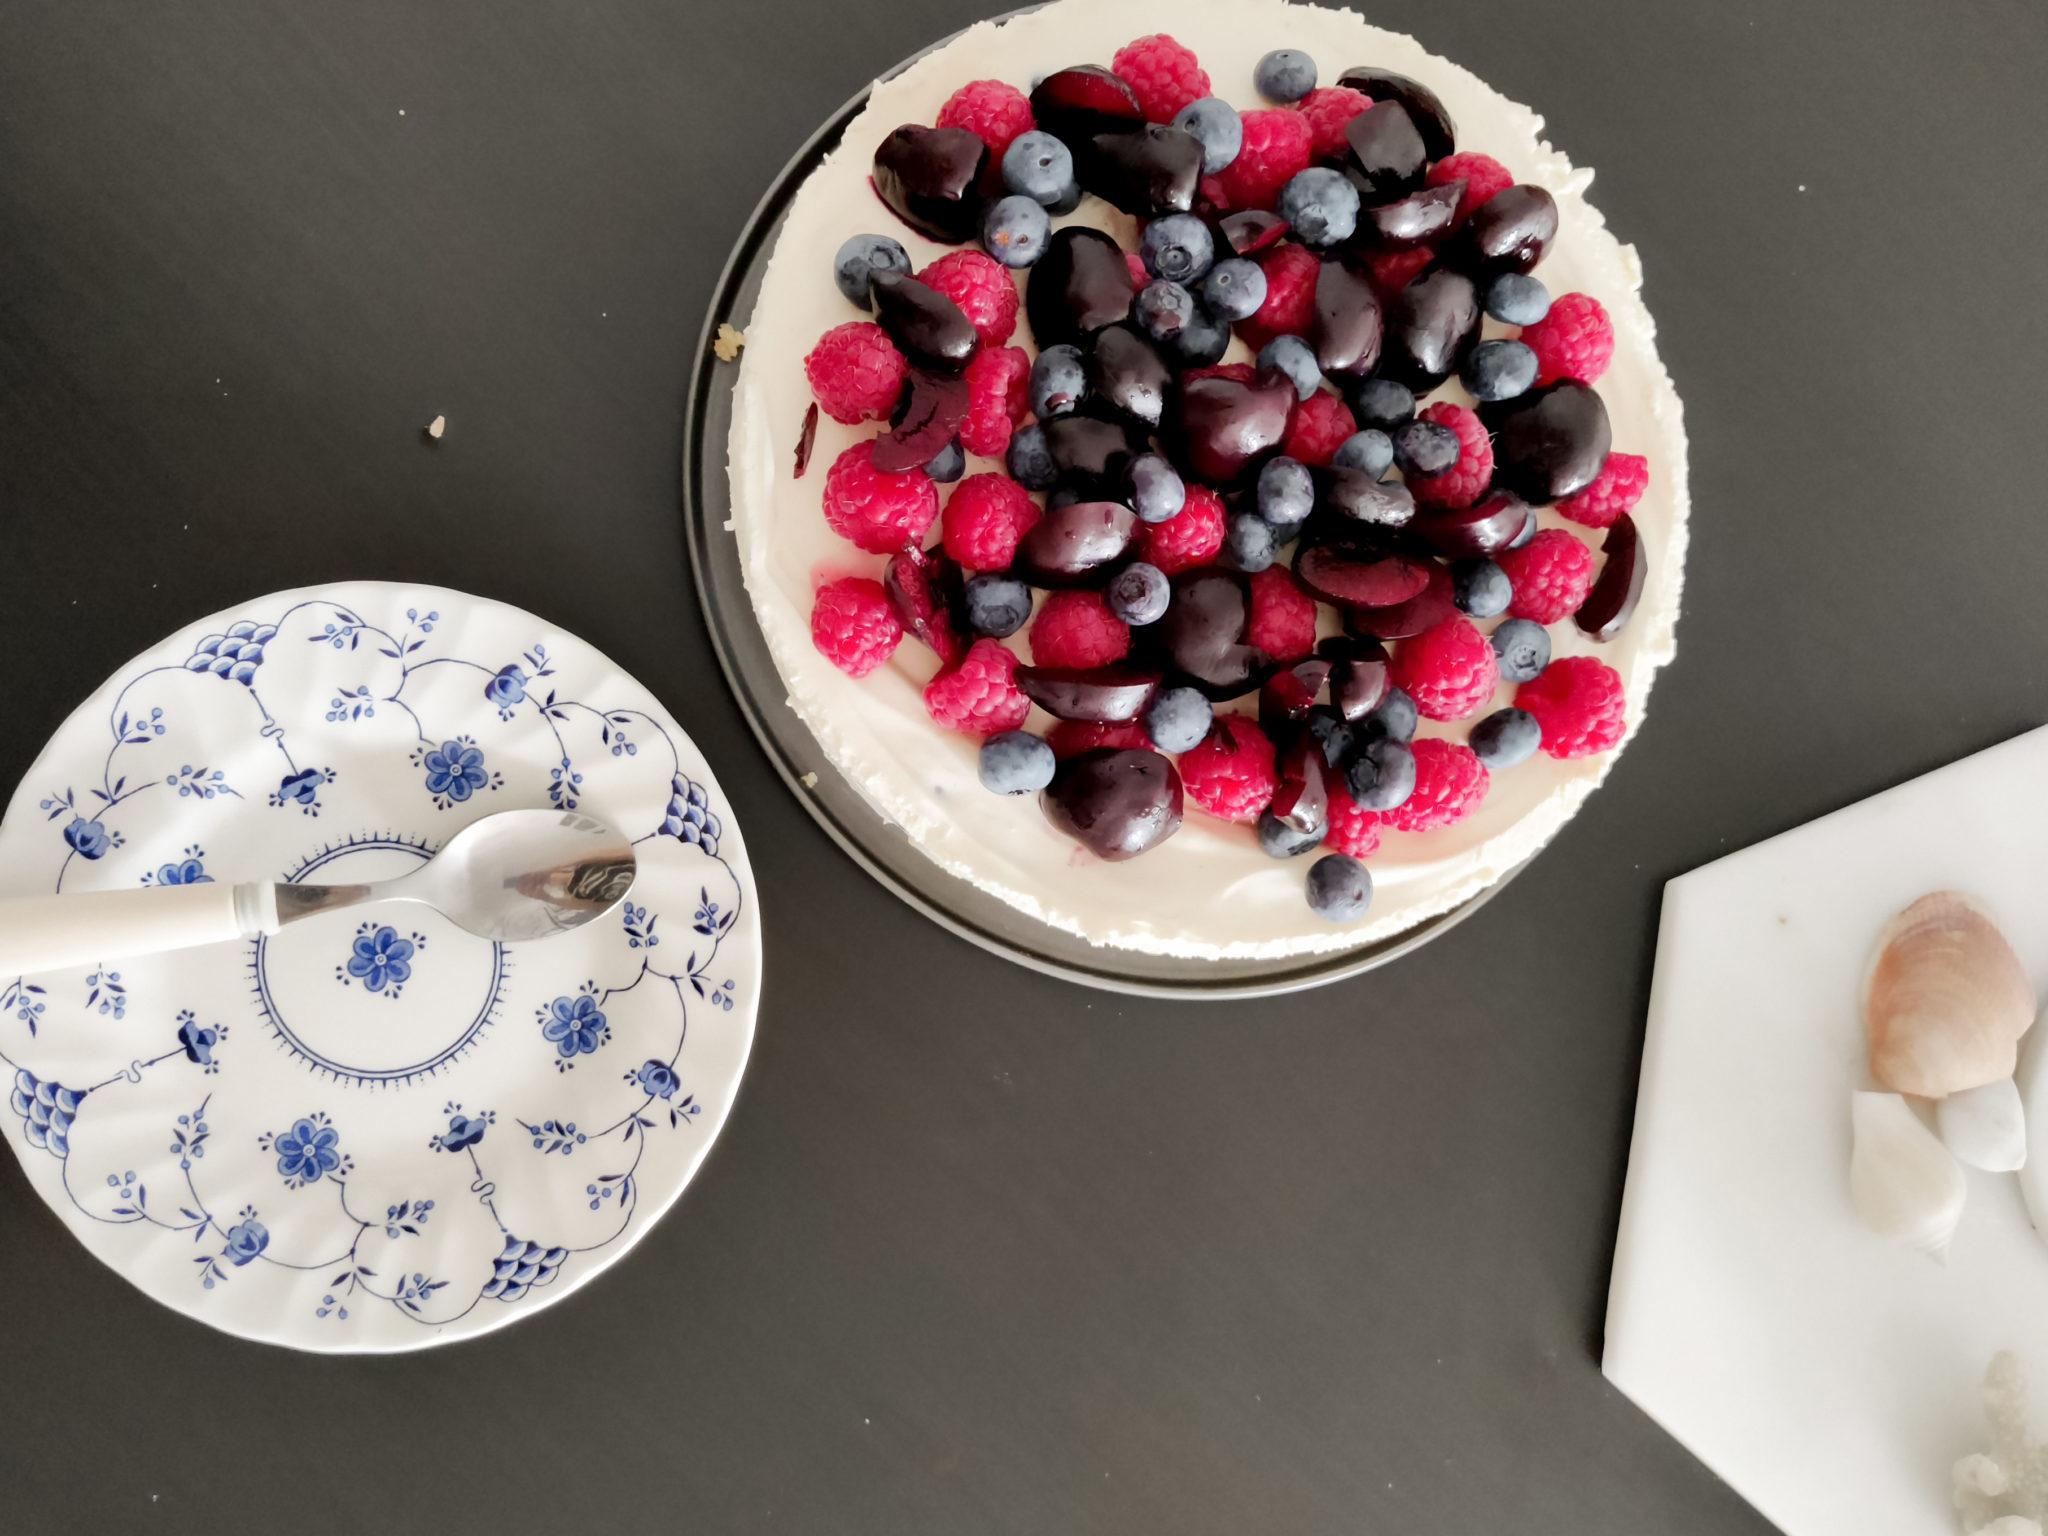 Sokeriton ja gluteeniton juustokakku - BMH - Big mamas home by Jenni